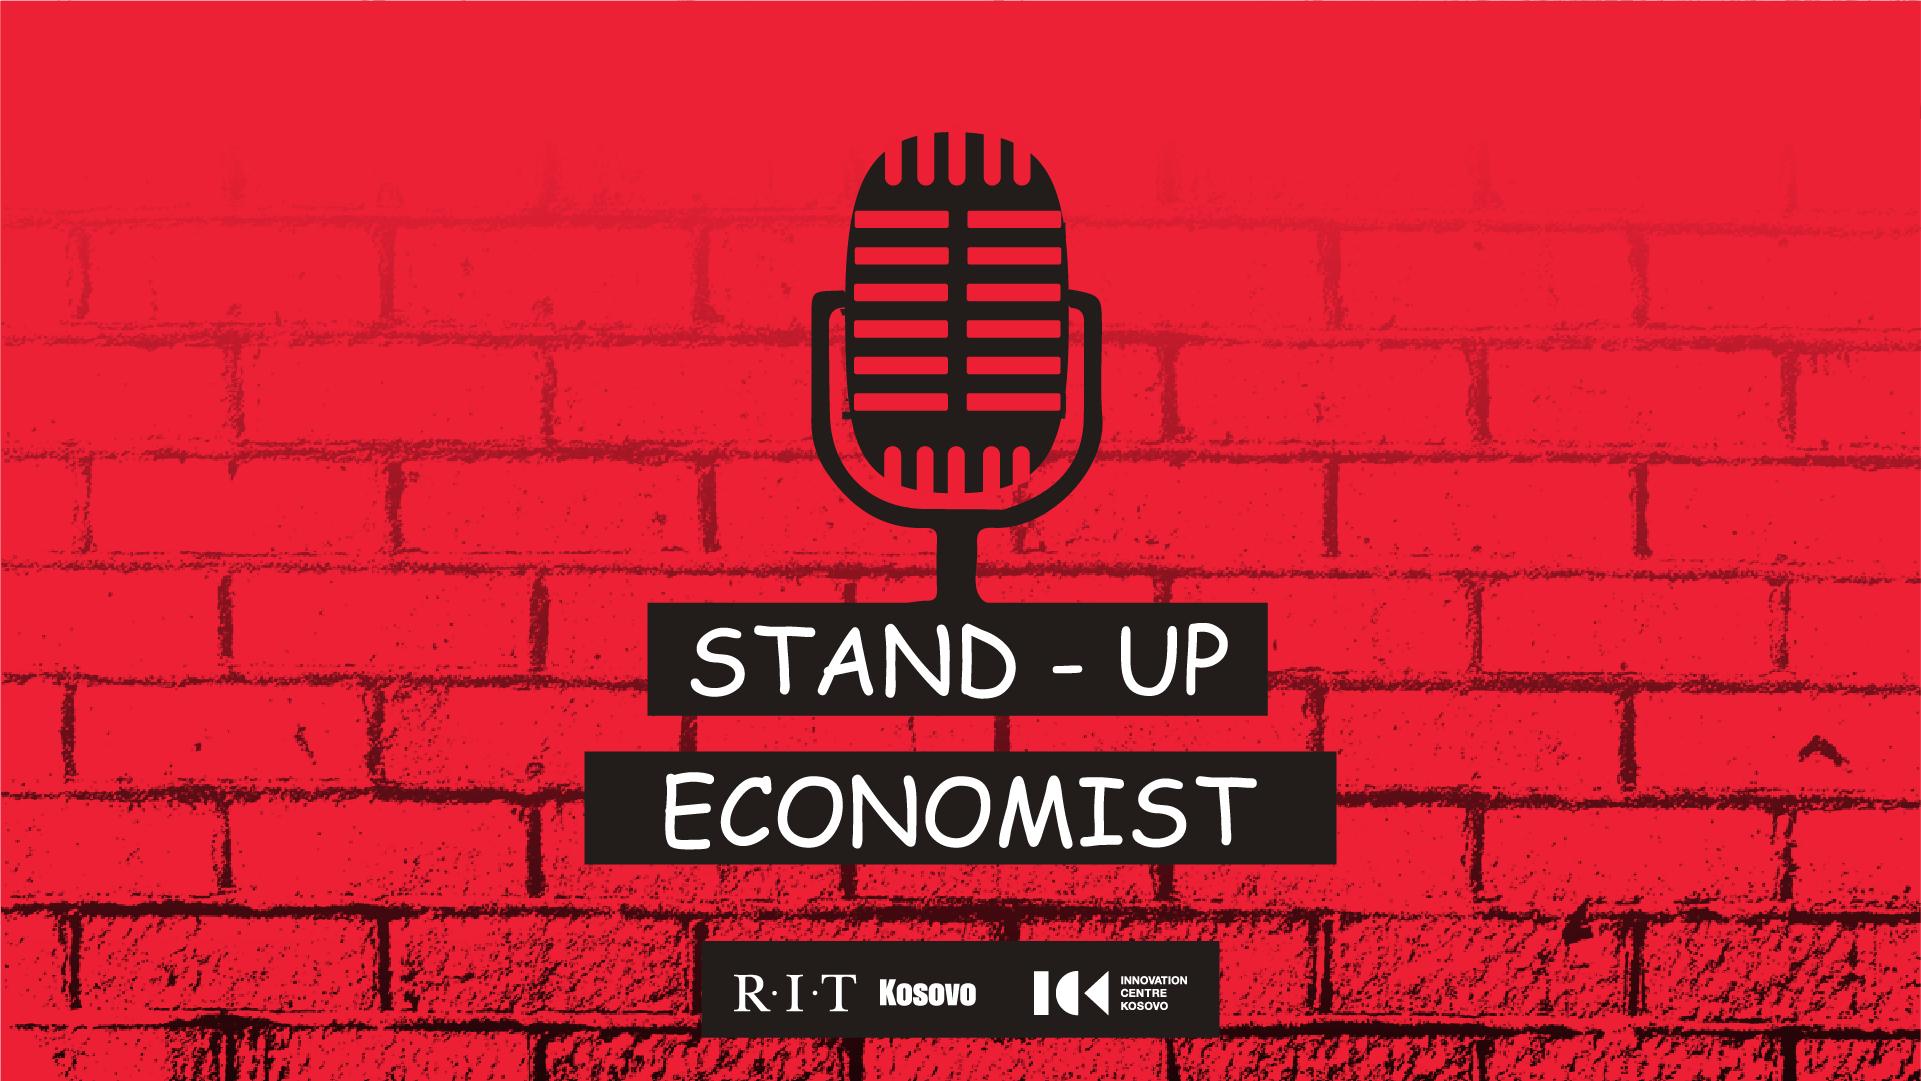 Stand-up Economist